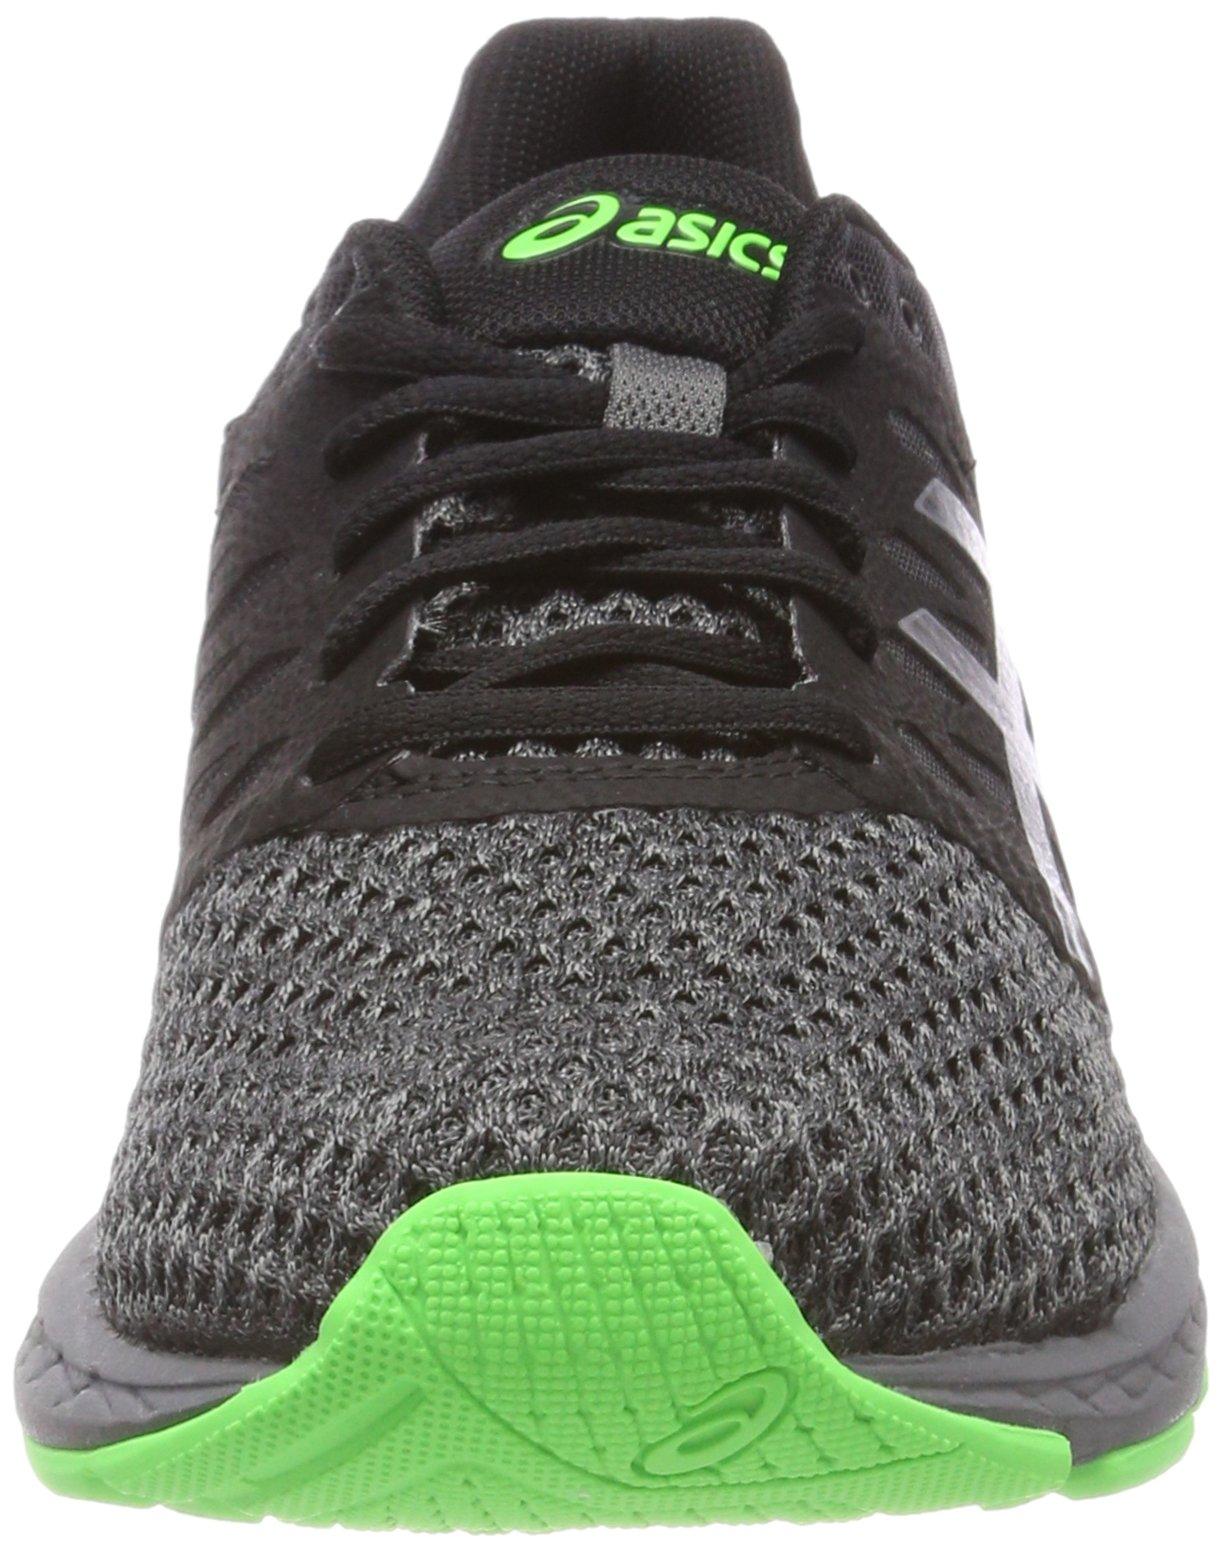 ASICS Unisex-Erwachsene Gel-Exalt 4 T7e0n-9097 Sneaker, Black Green ... af4a098e26